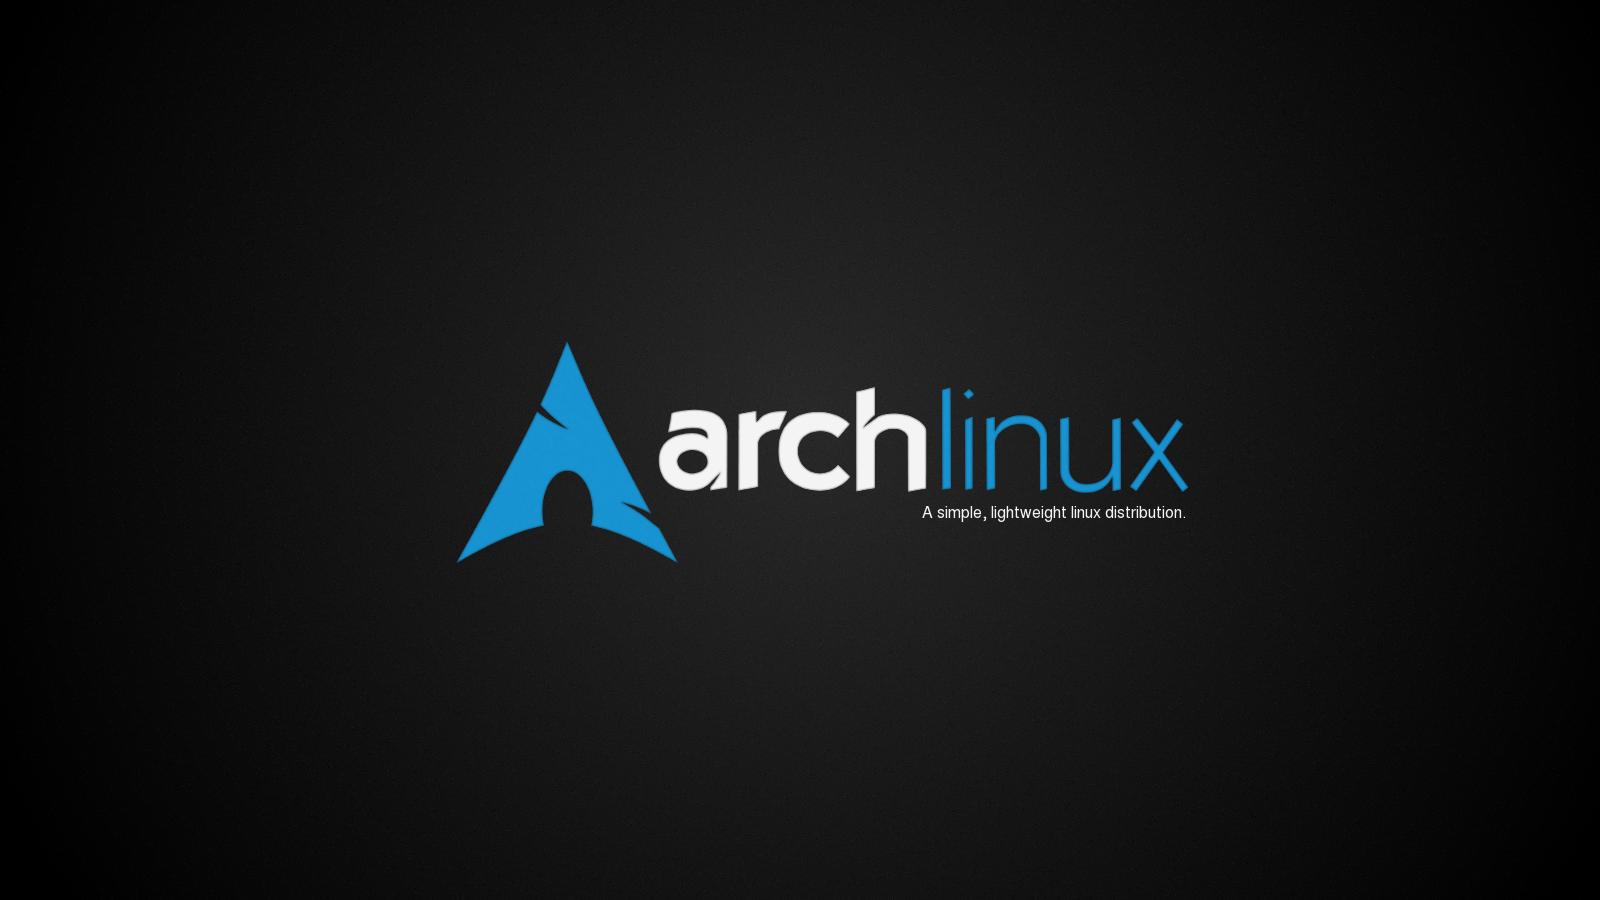 arch linux wallpaper dark by kjeksomanen customization wallpaper mac 1600x900